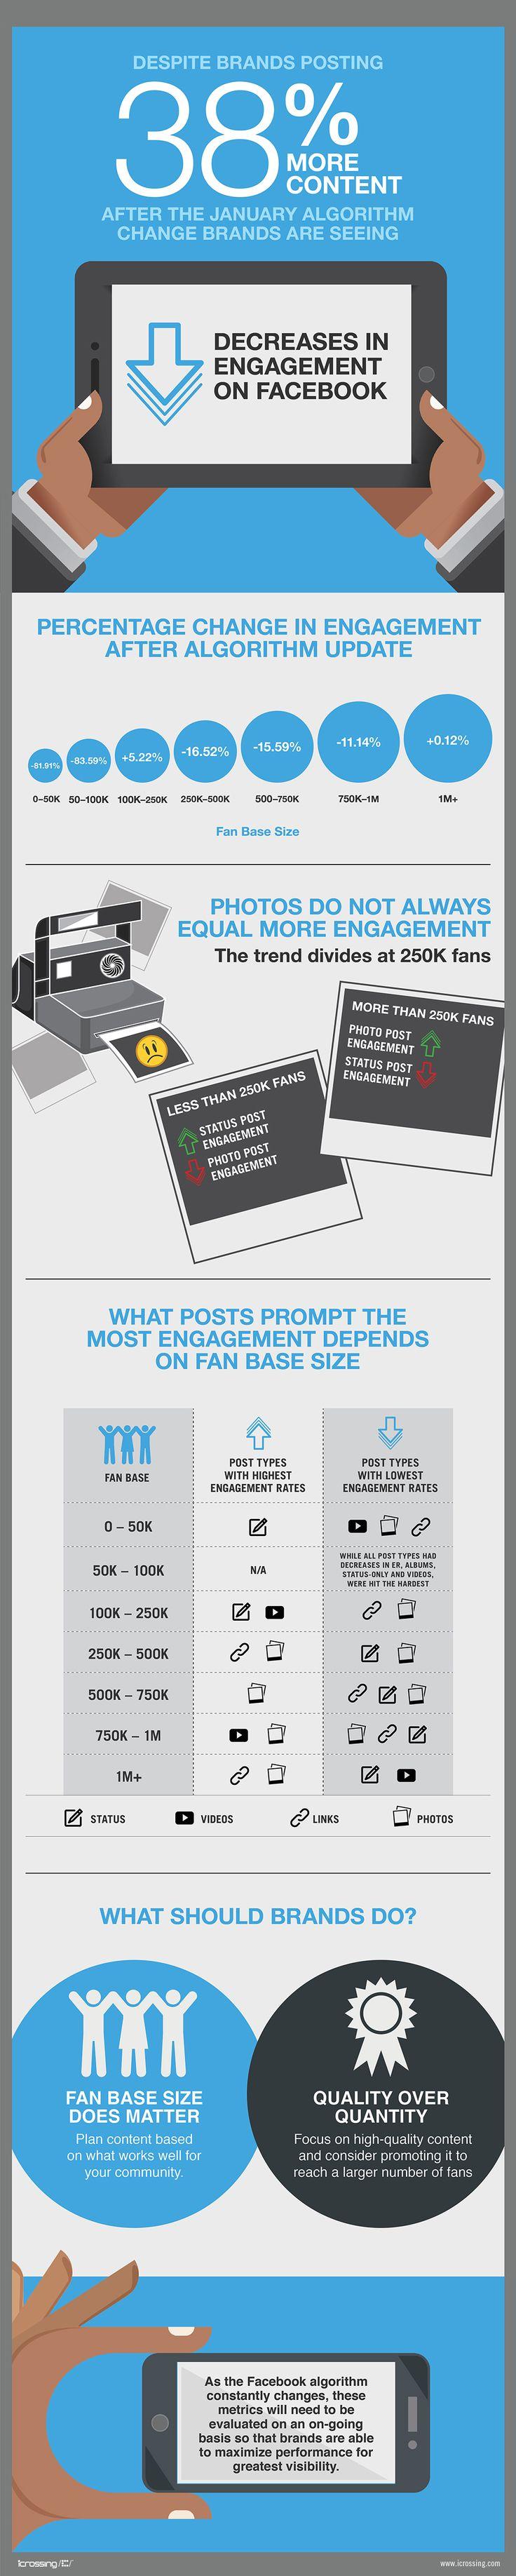 Decrease in engagement on Facebook.  #Fanpage #Views #Reach